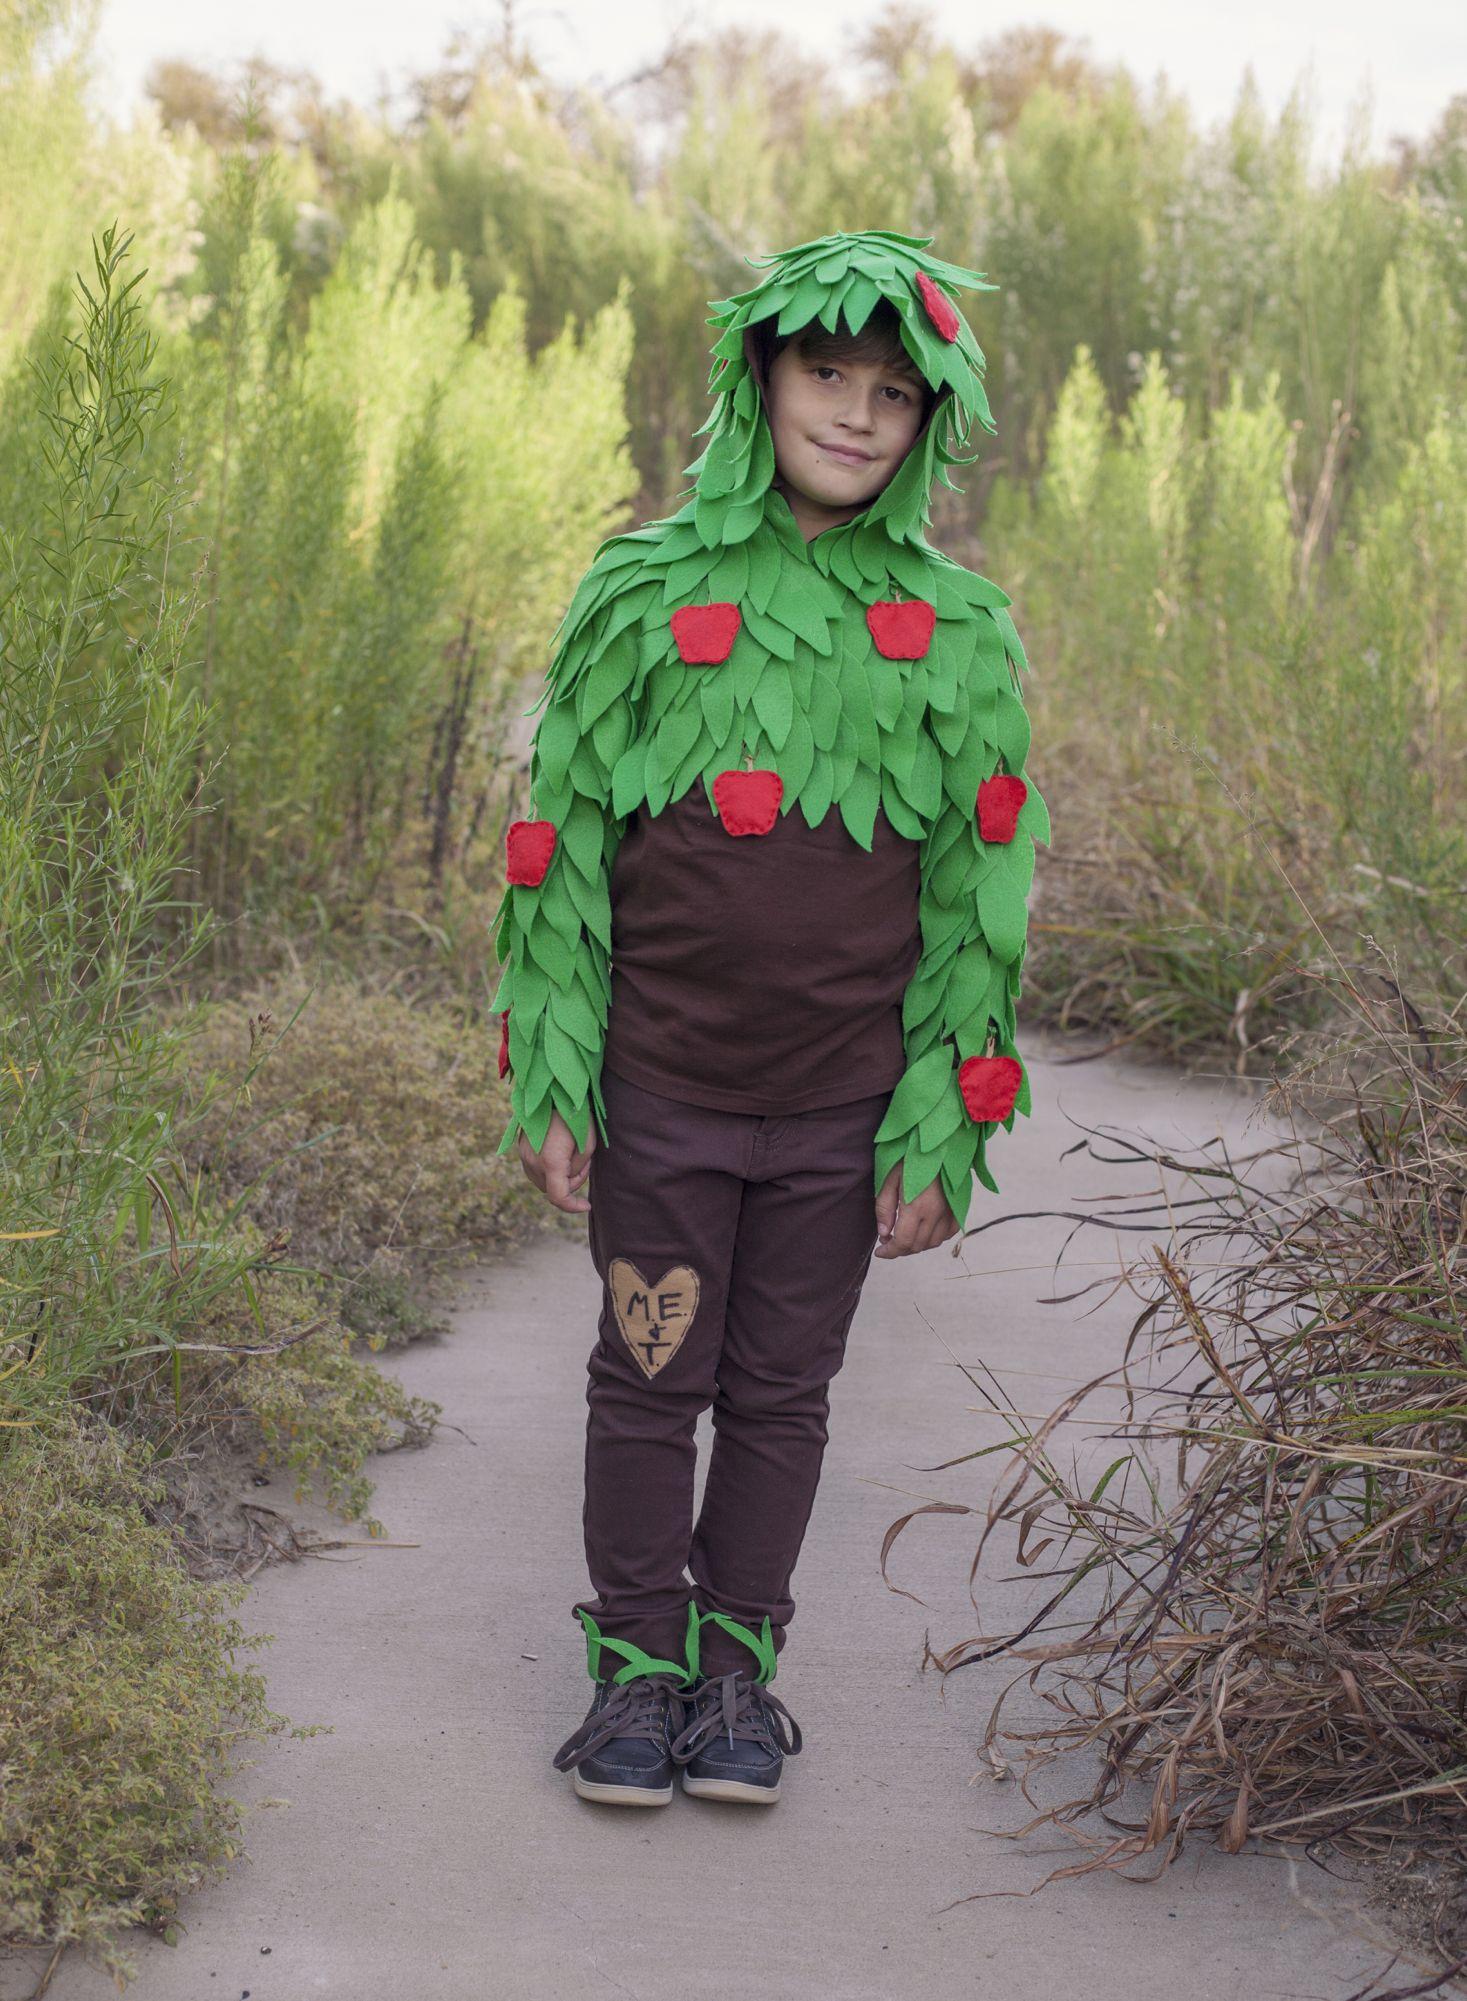 Giving Tree Costume Idea Felt Leaves With